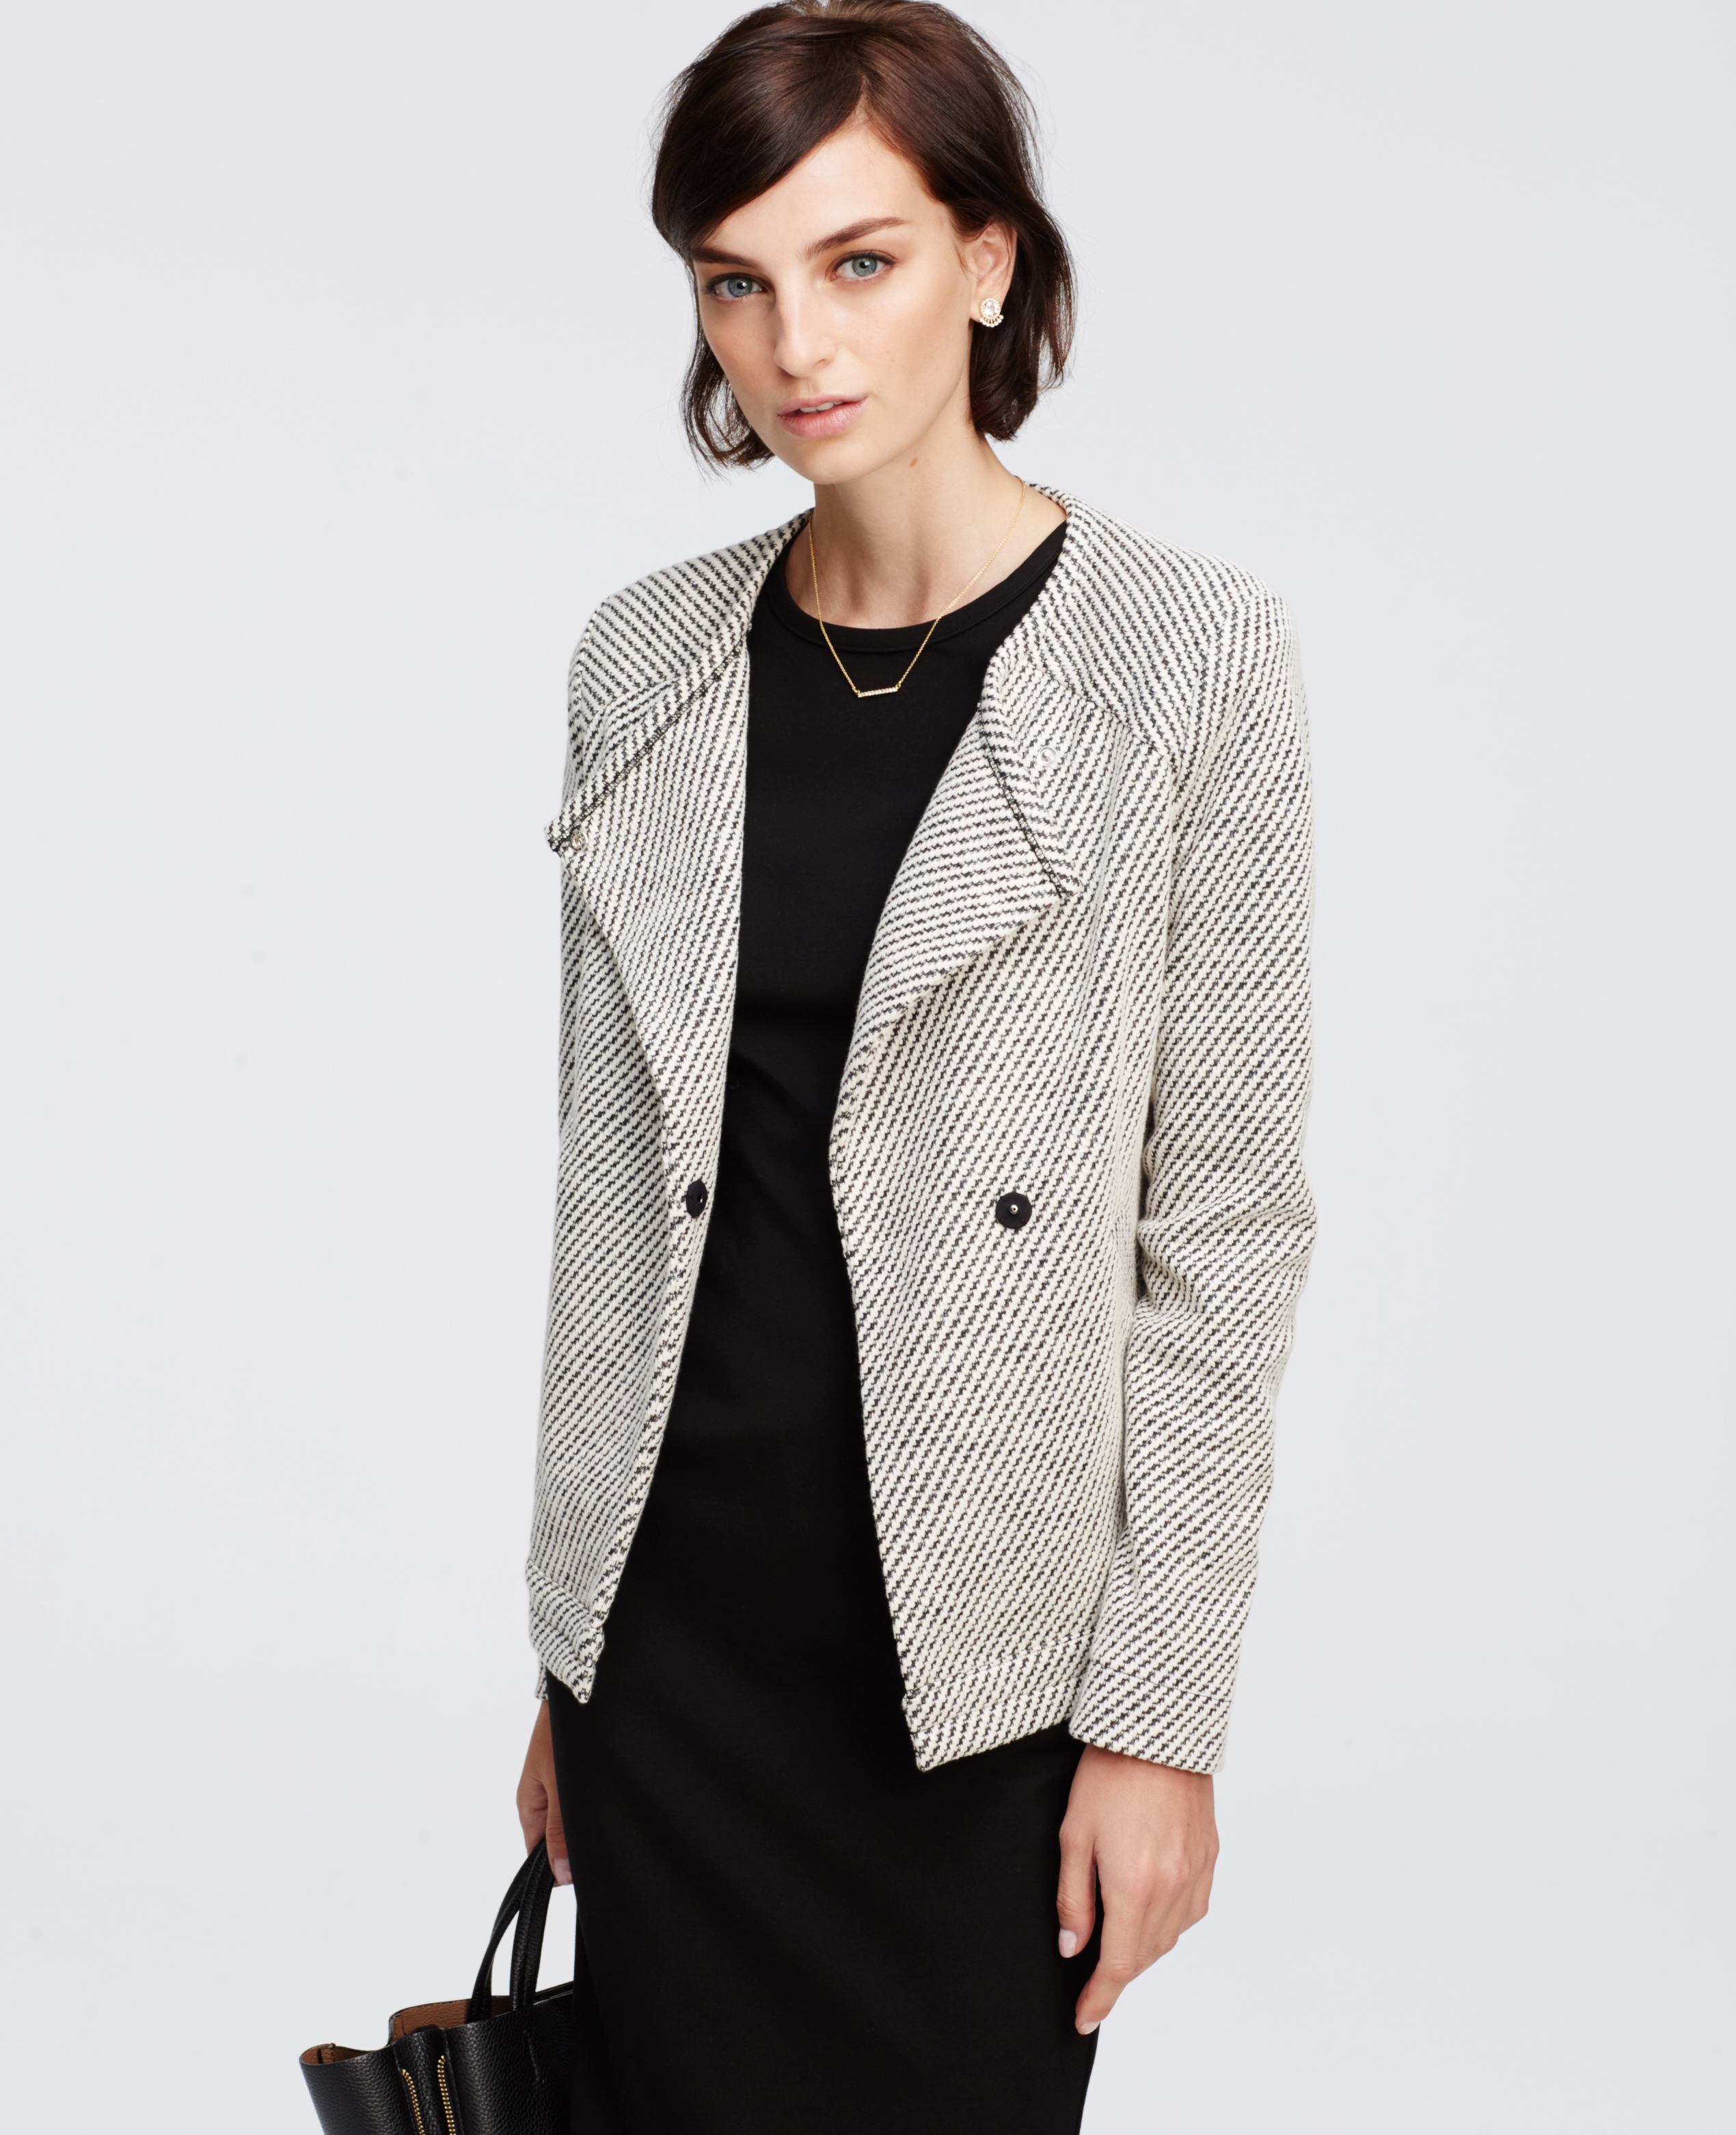 Black floral print textured jacket